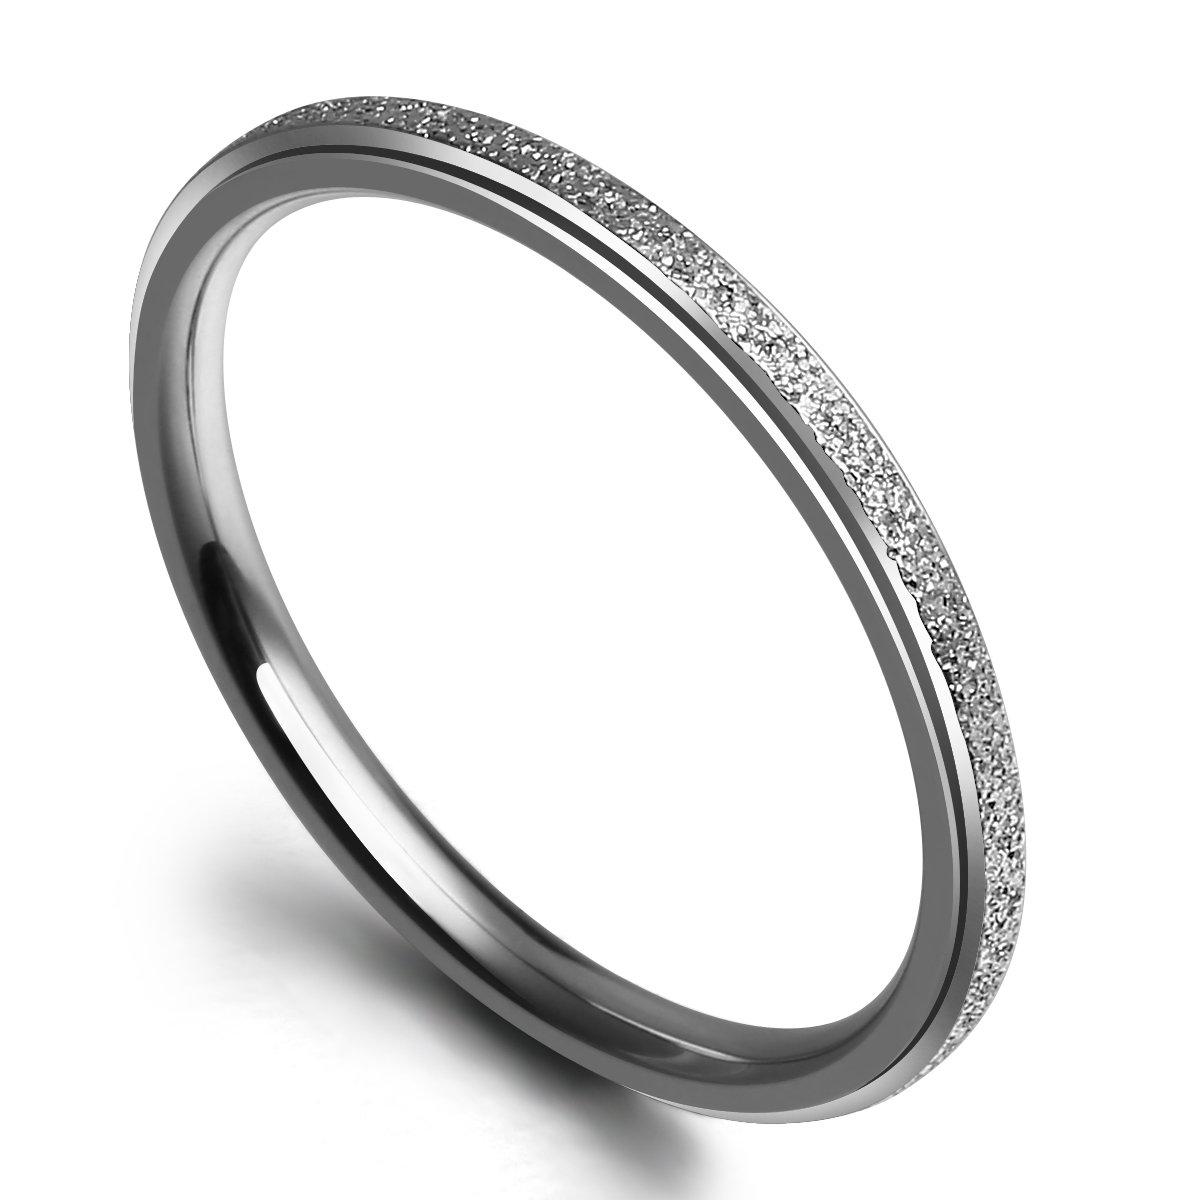 NaNa Chic Jewelry 2mm Titanium Ring Wedding Band Sparkle Sandblast Comfort Fit(7.5)